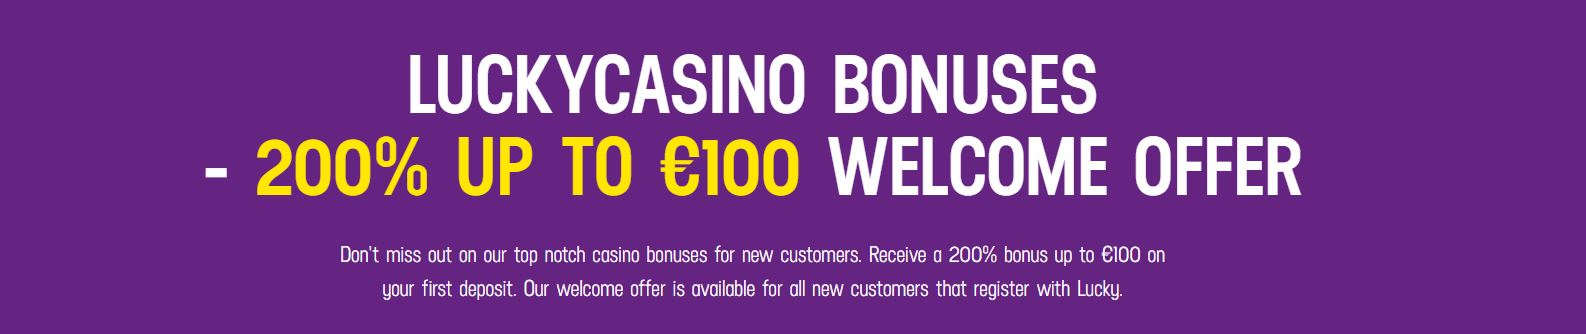 lucky casino 200% bonus